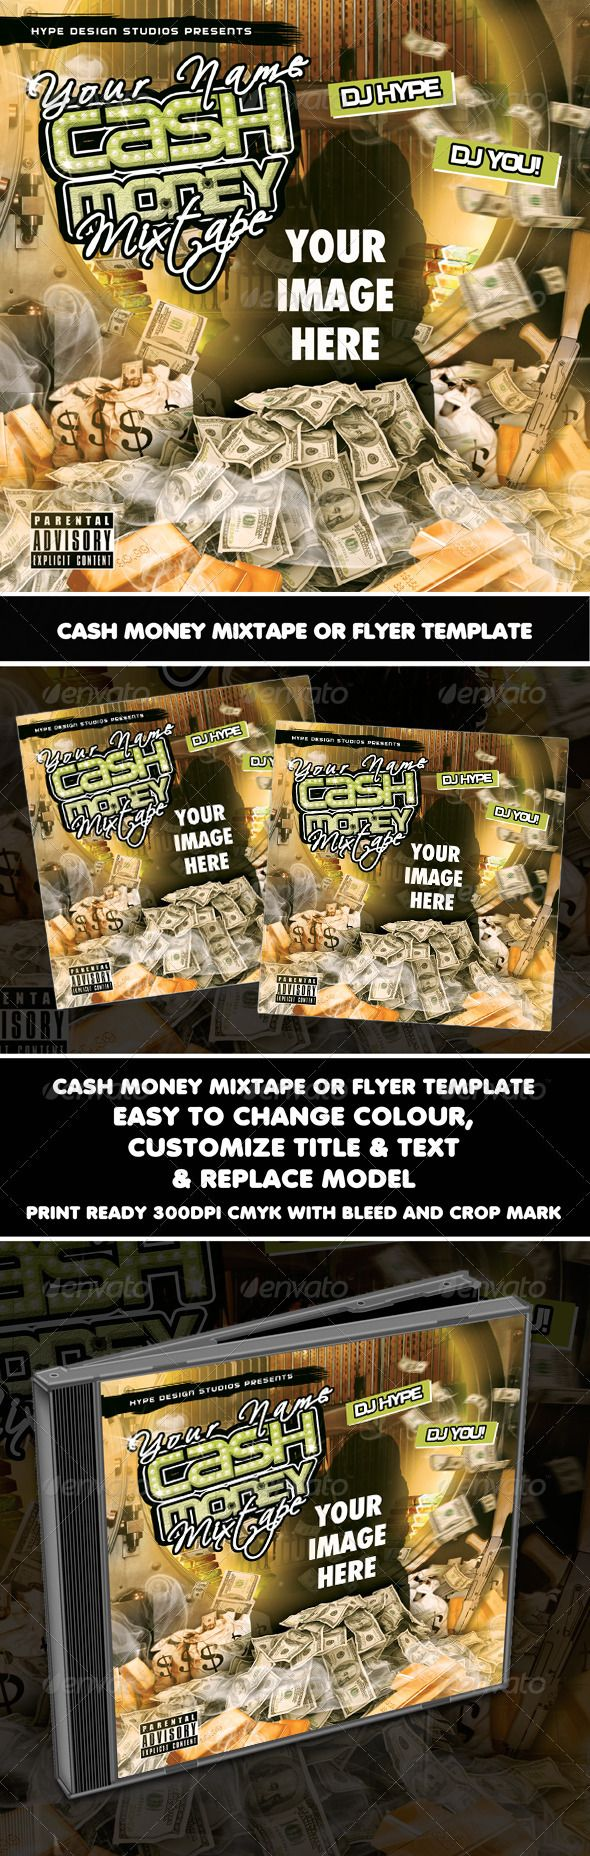 Cash Money Mixtape Or Flyer Template Pinterest Cash Money Flyer - Money flyer template